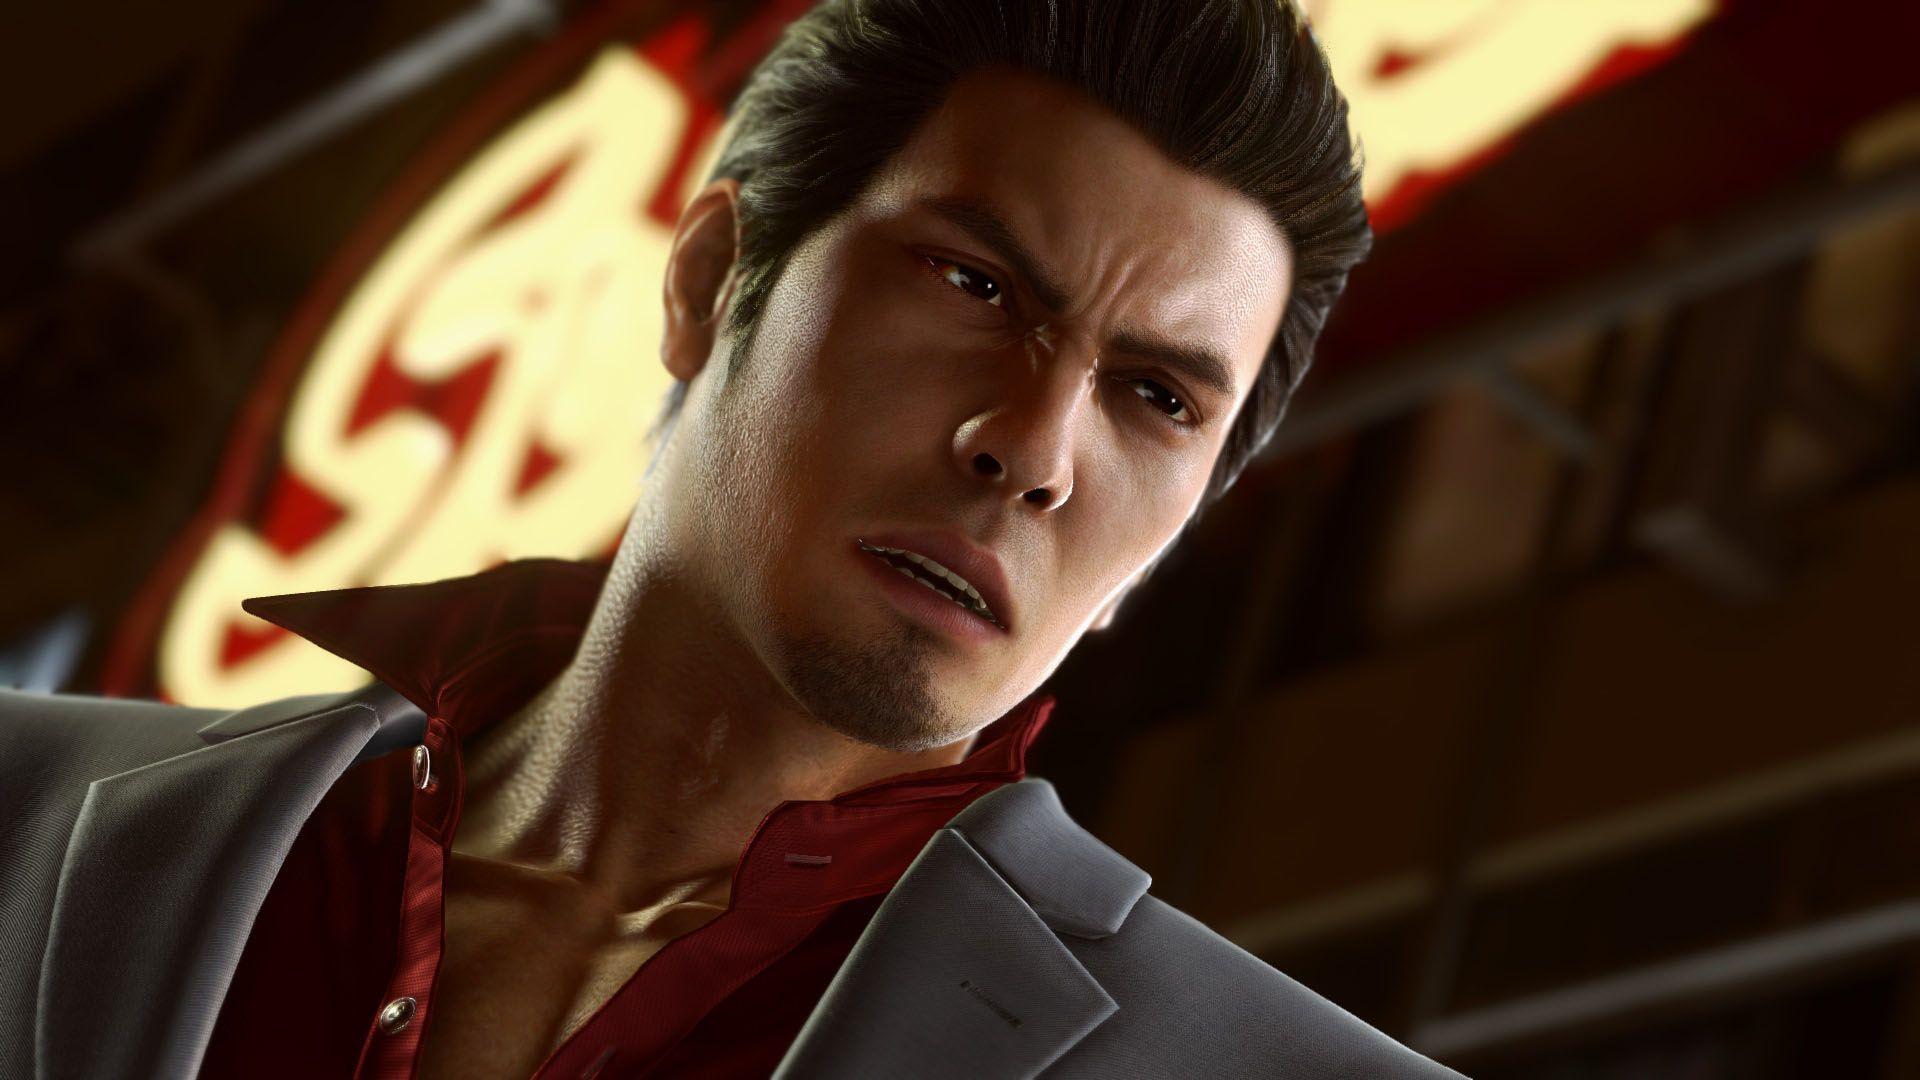 Download Yakuza 0 HD Wallpapers - Read games review, play online games & download games wallpapers